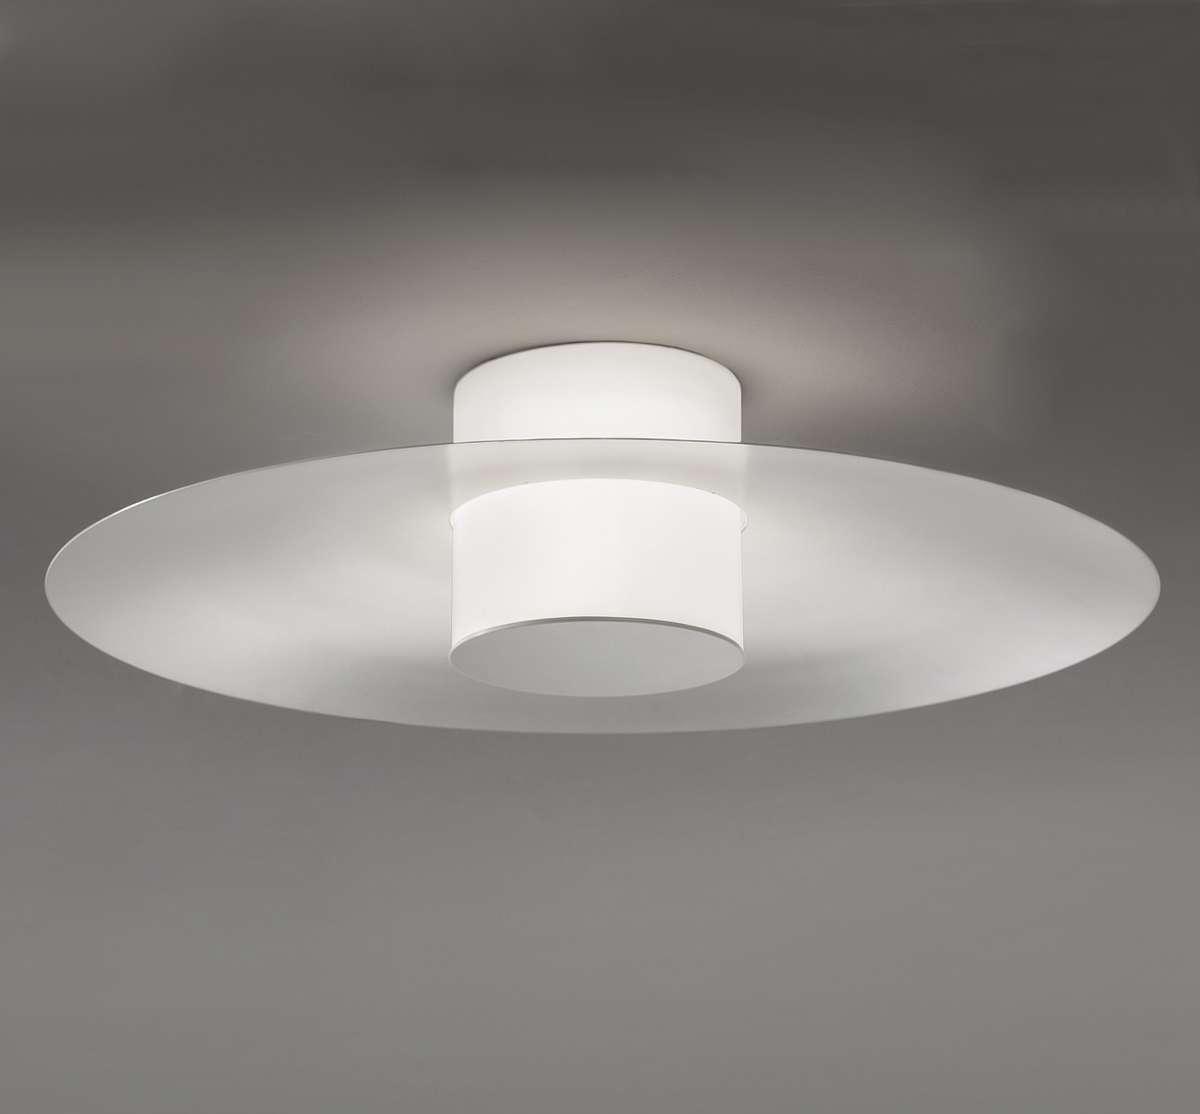 studio italia lighting. Studio Italia Lighting N